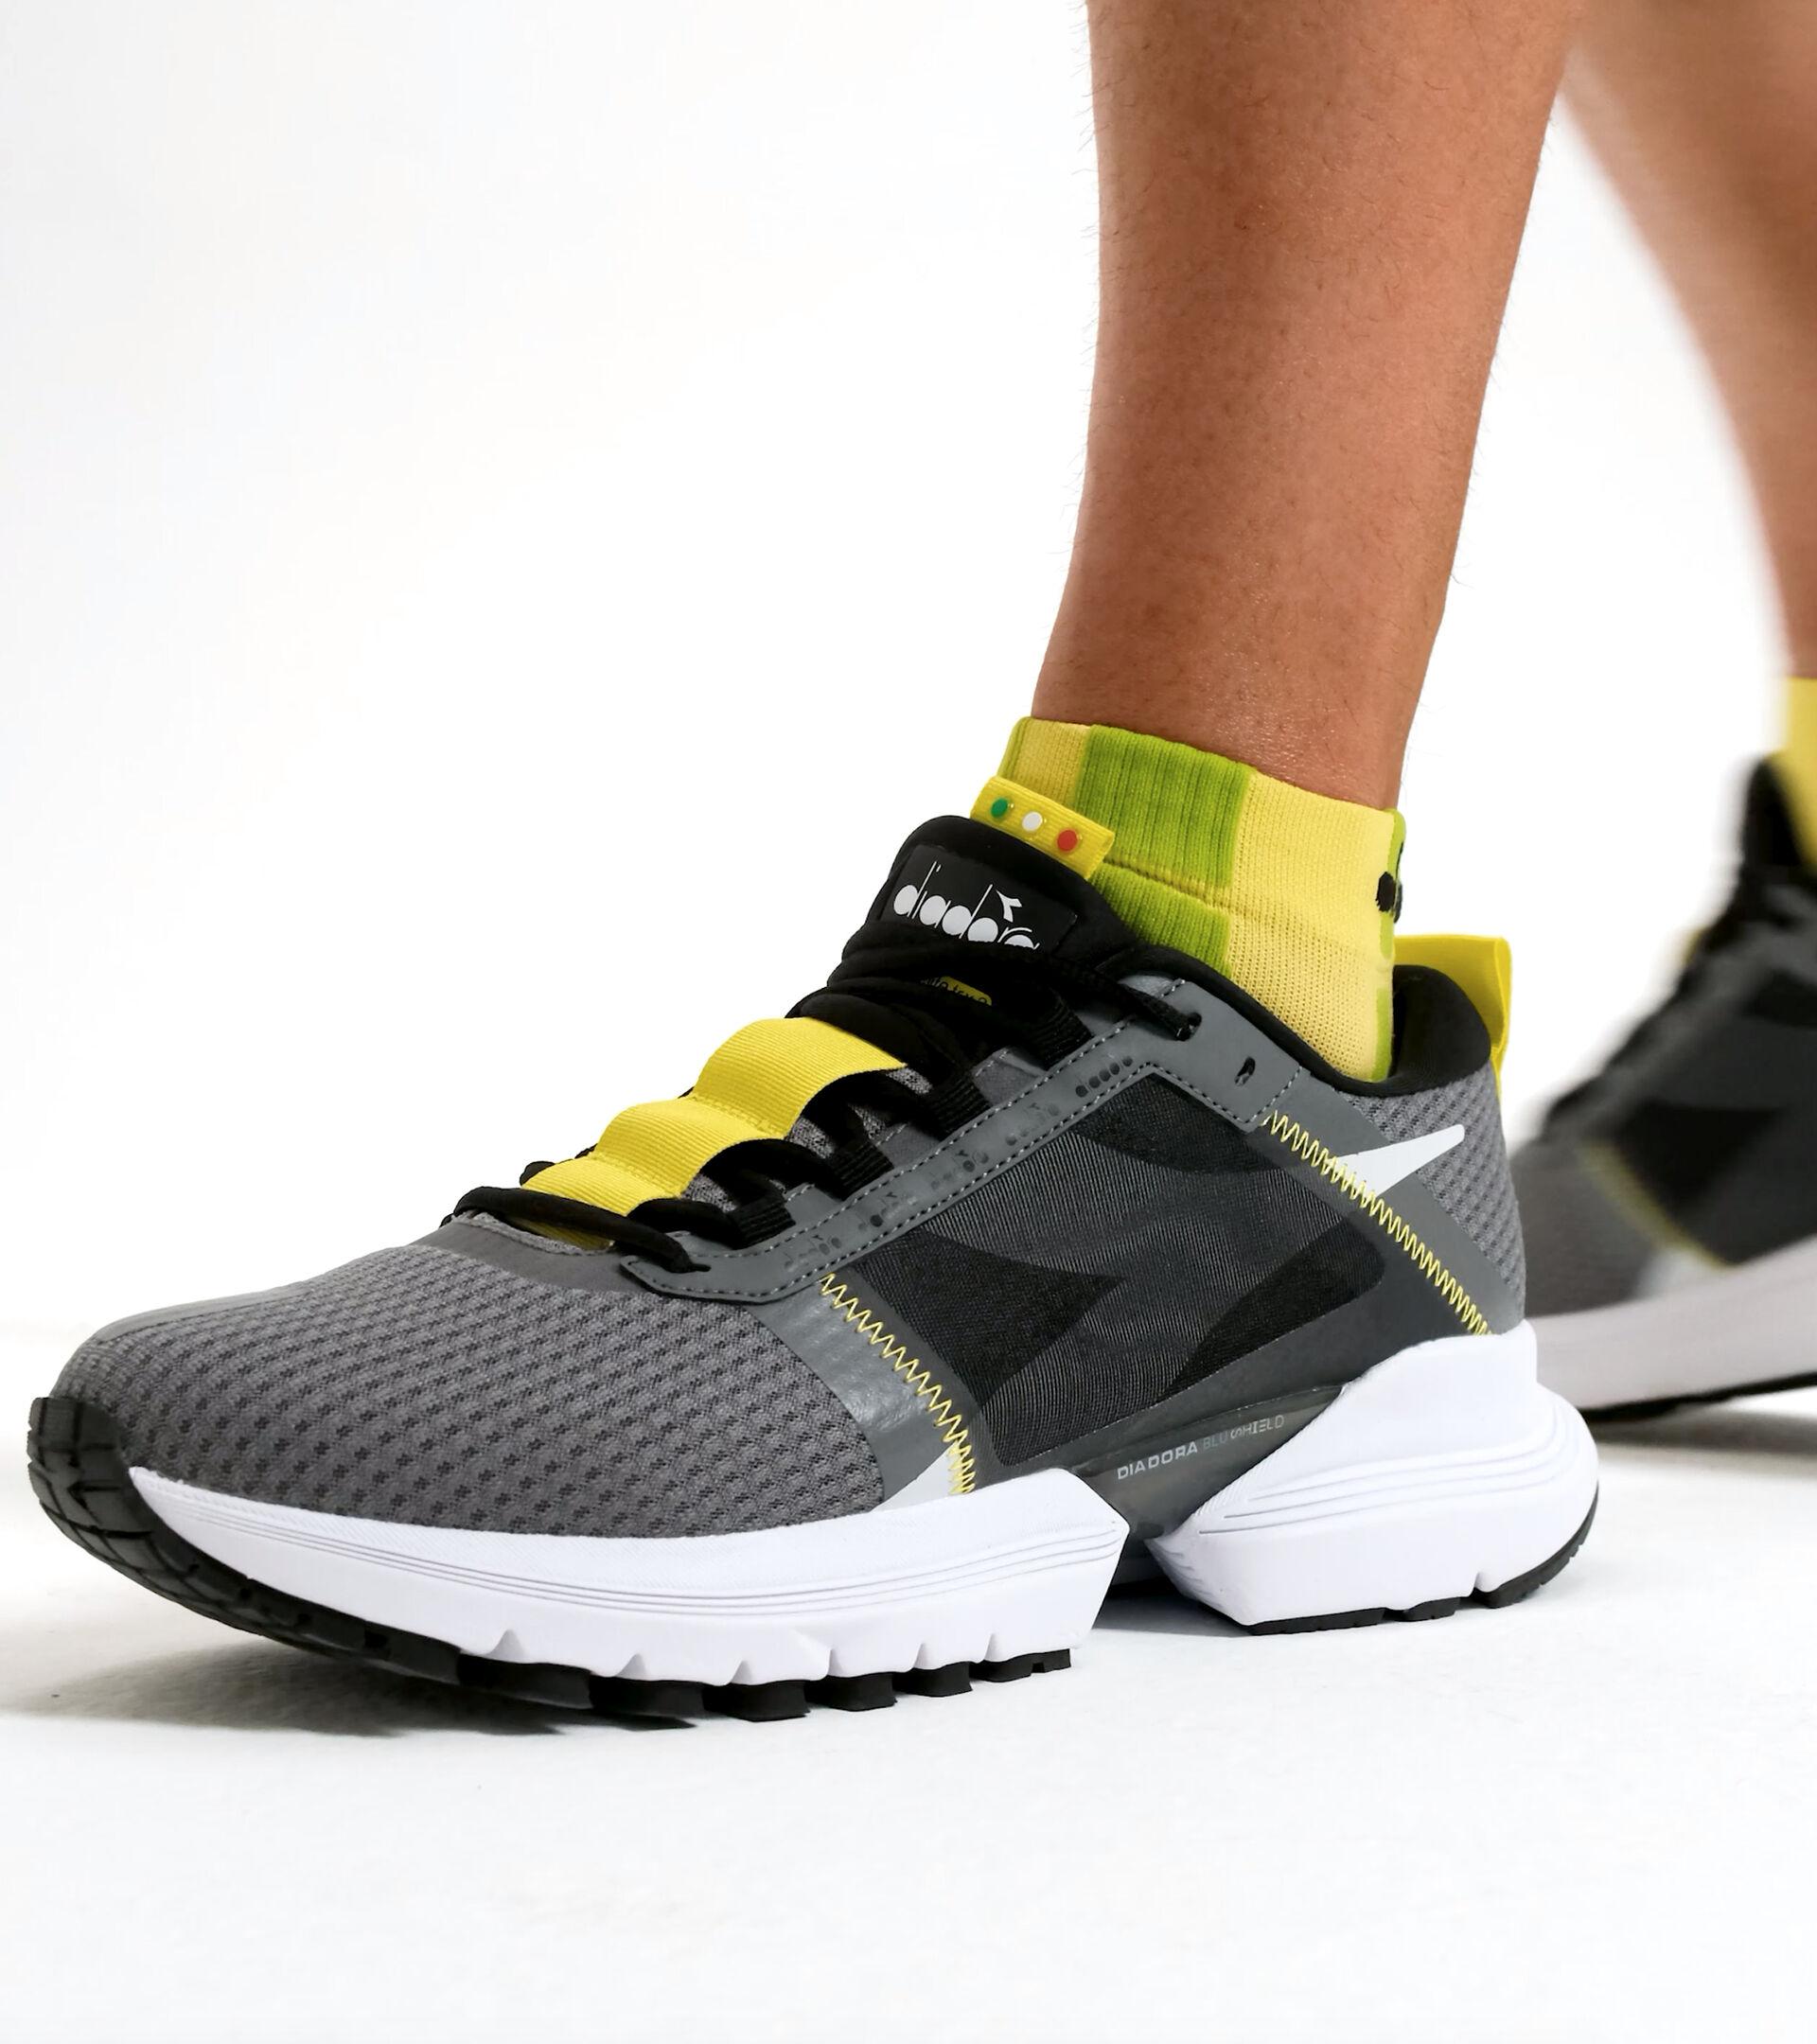 Footwear Sport UOMO MYTHOS BLUSHIELD ELITE TRX 2 GRIGIO ACCIAIO/NERO Diadora